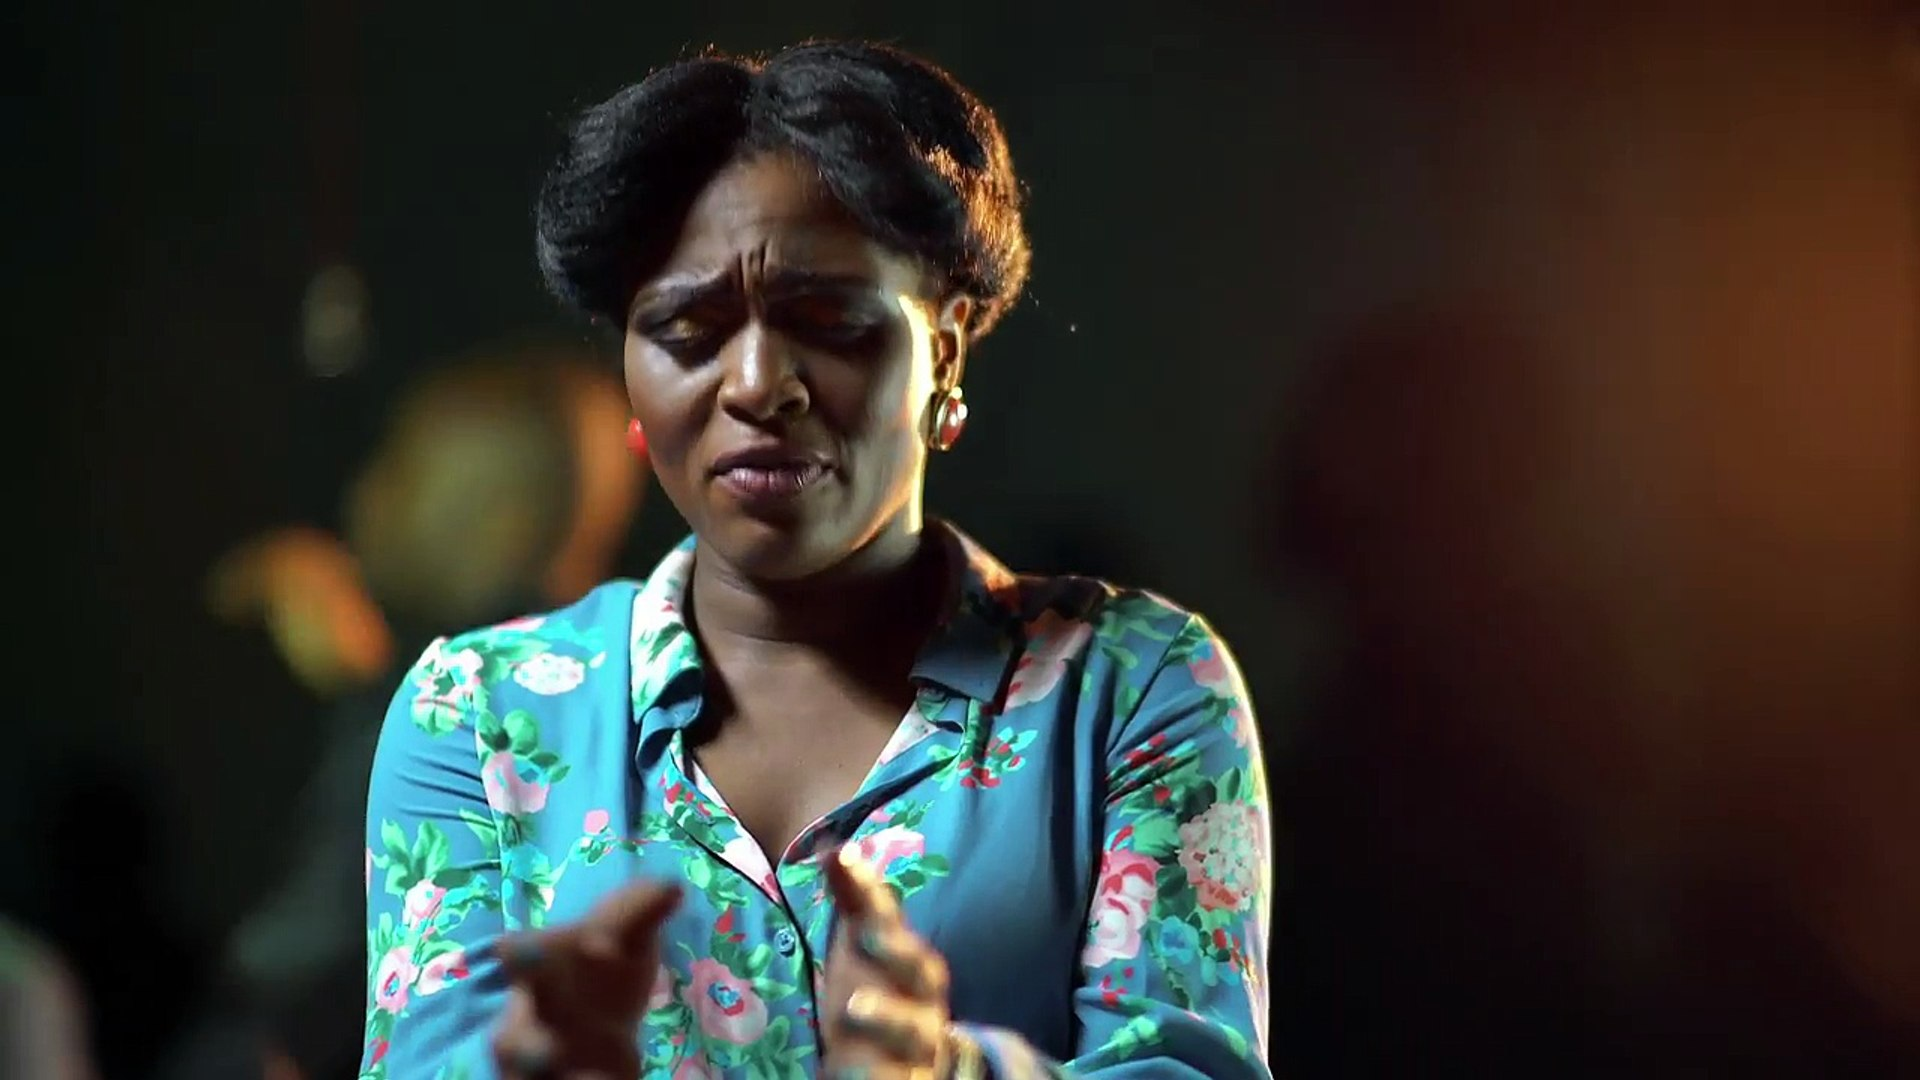 Dena Mwana - Emmanuel feat El Georges - Vidéo Dailymotion